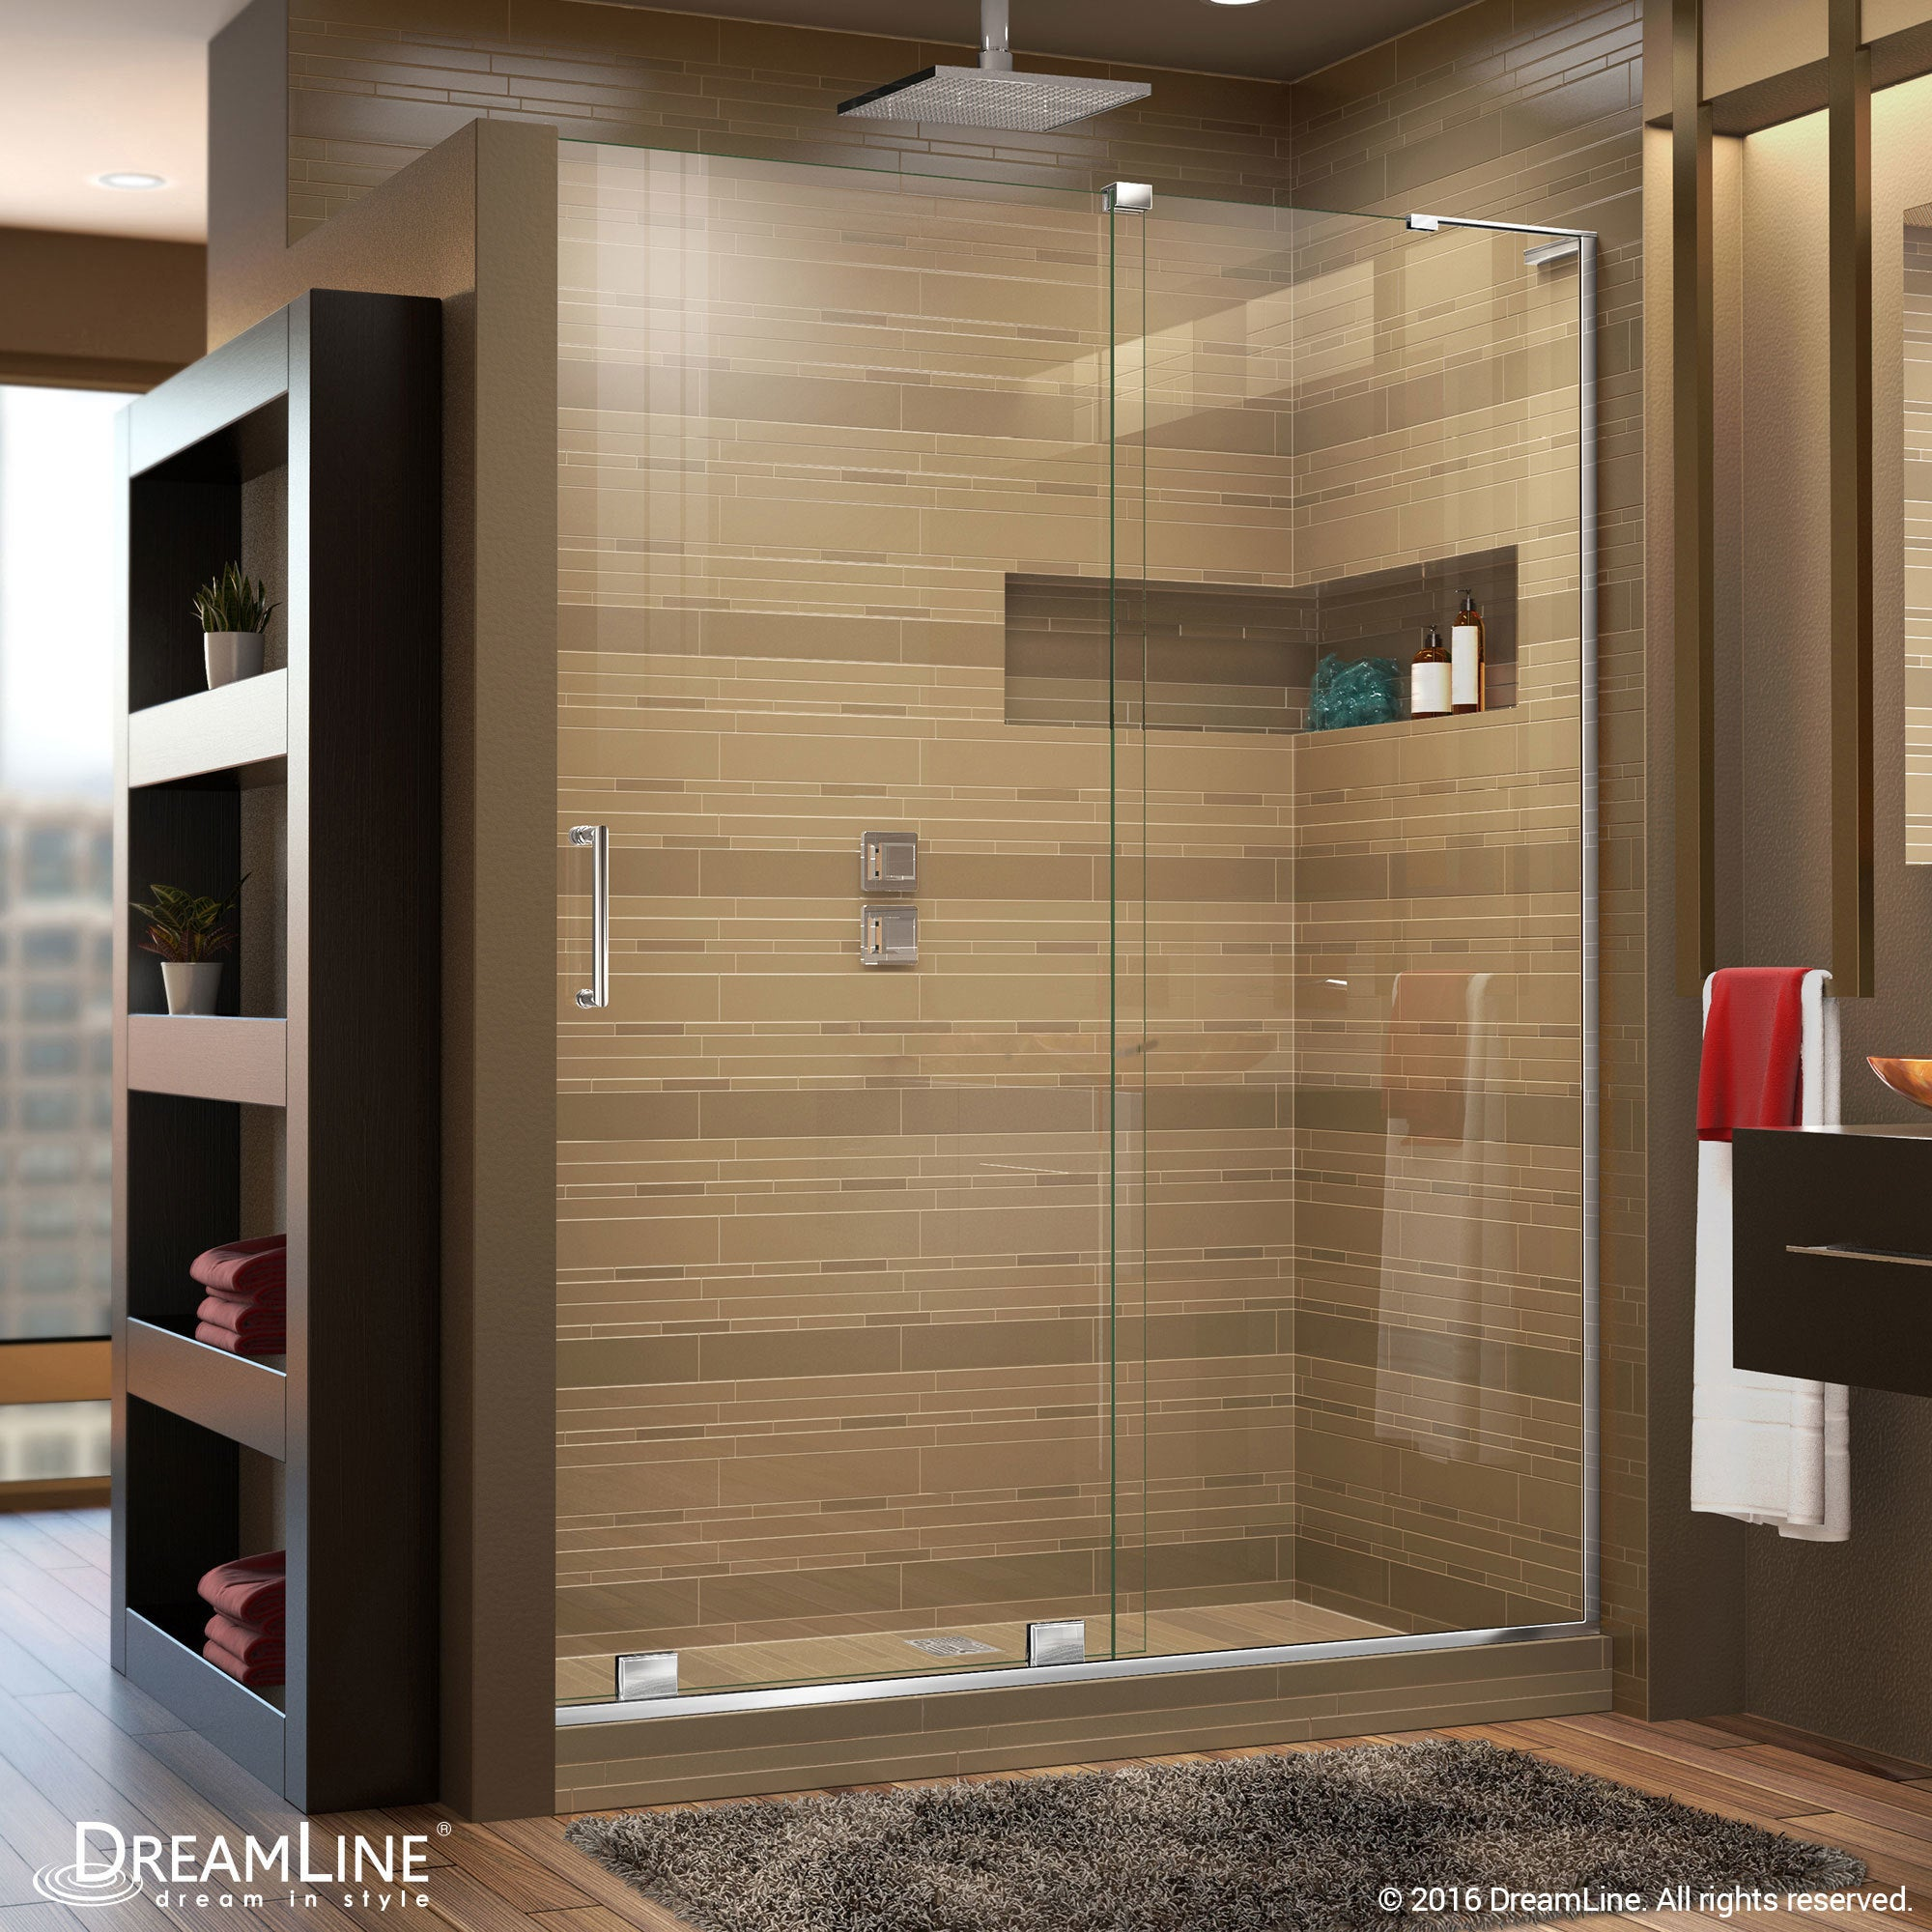 Shop DreamLine Mirage-X 44 - 48 in. W x 72 in. H Sliding Shower Door ...